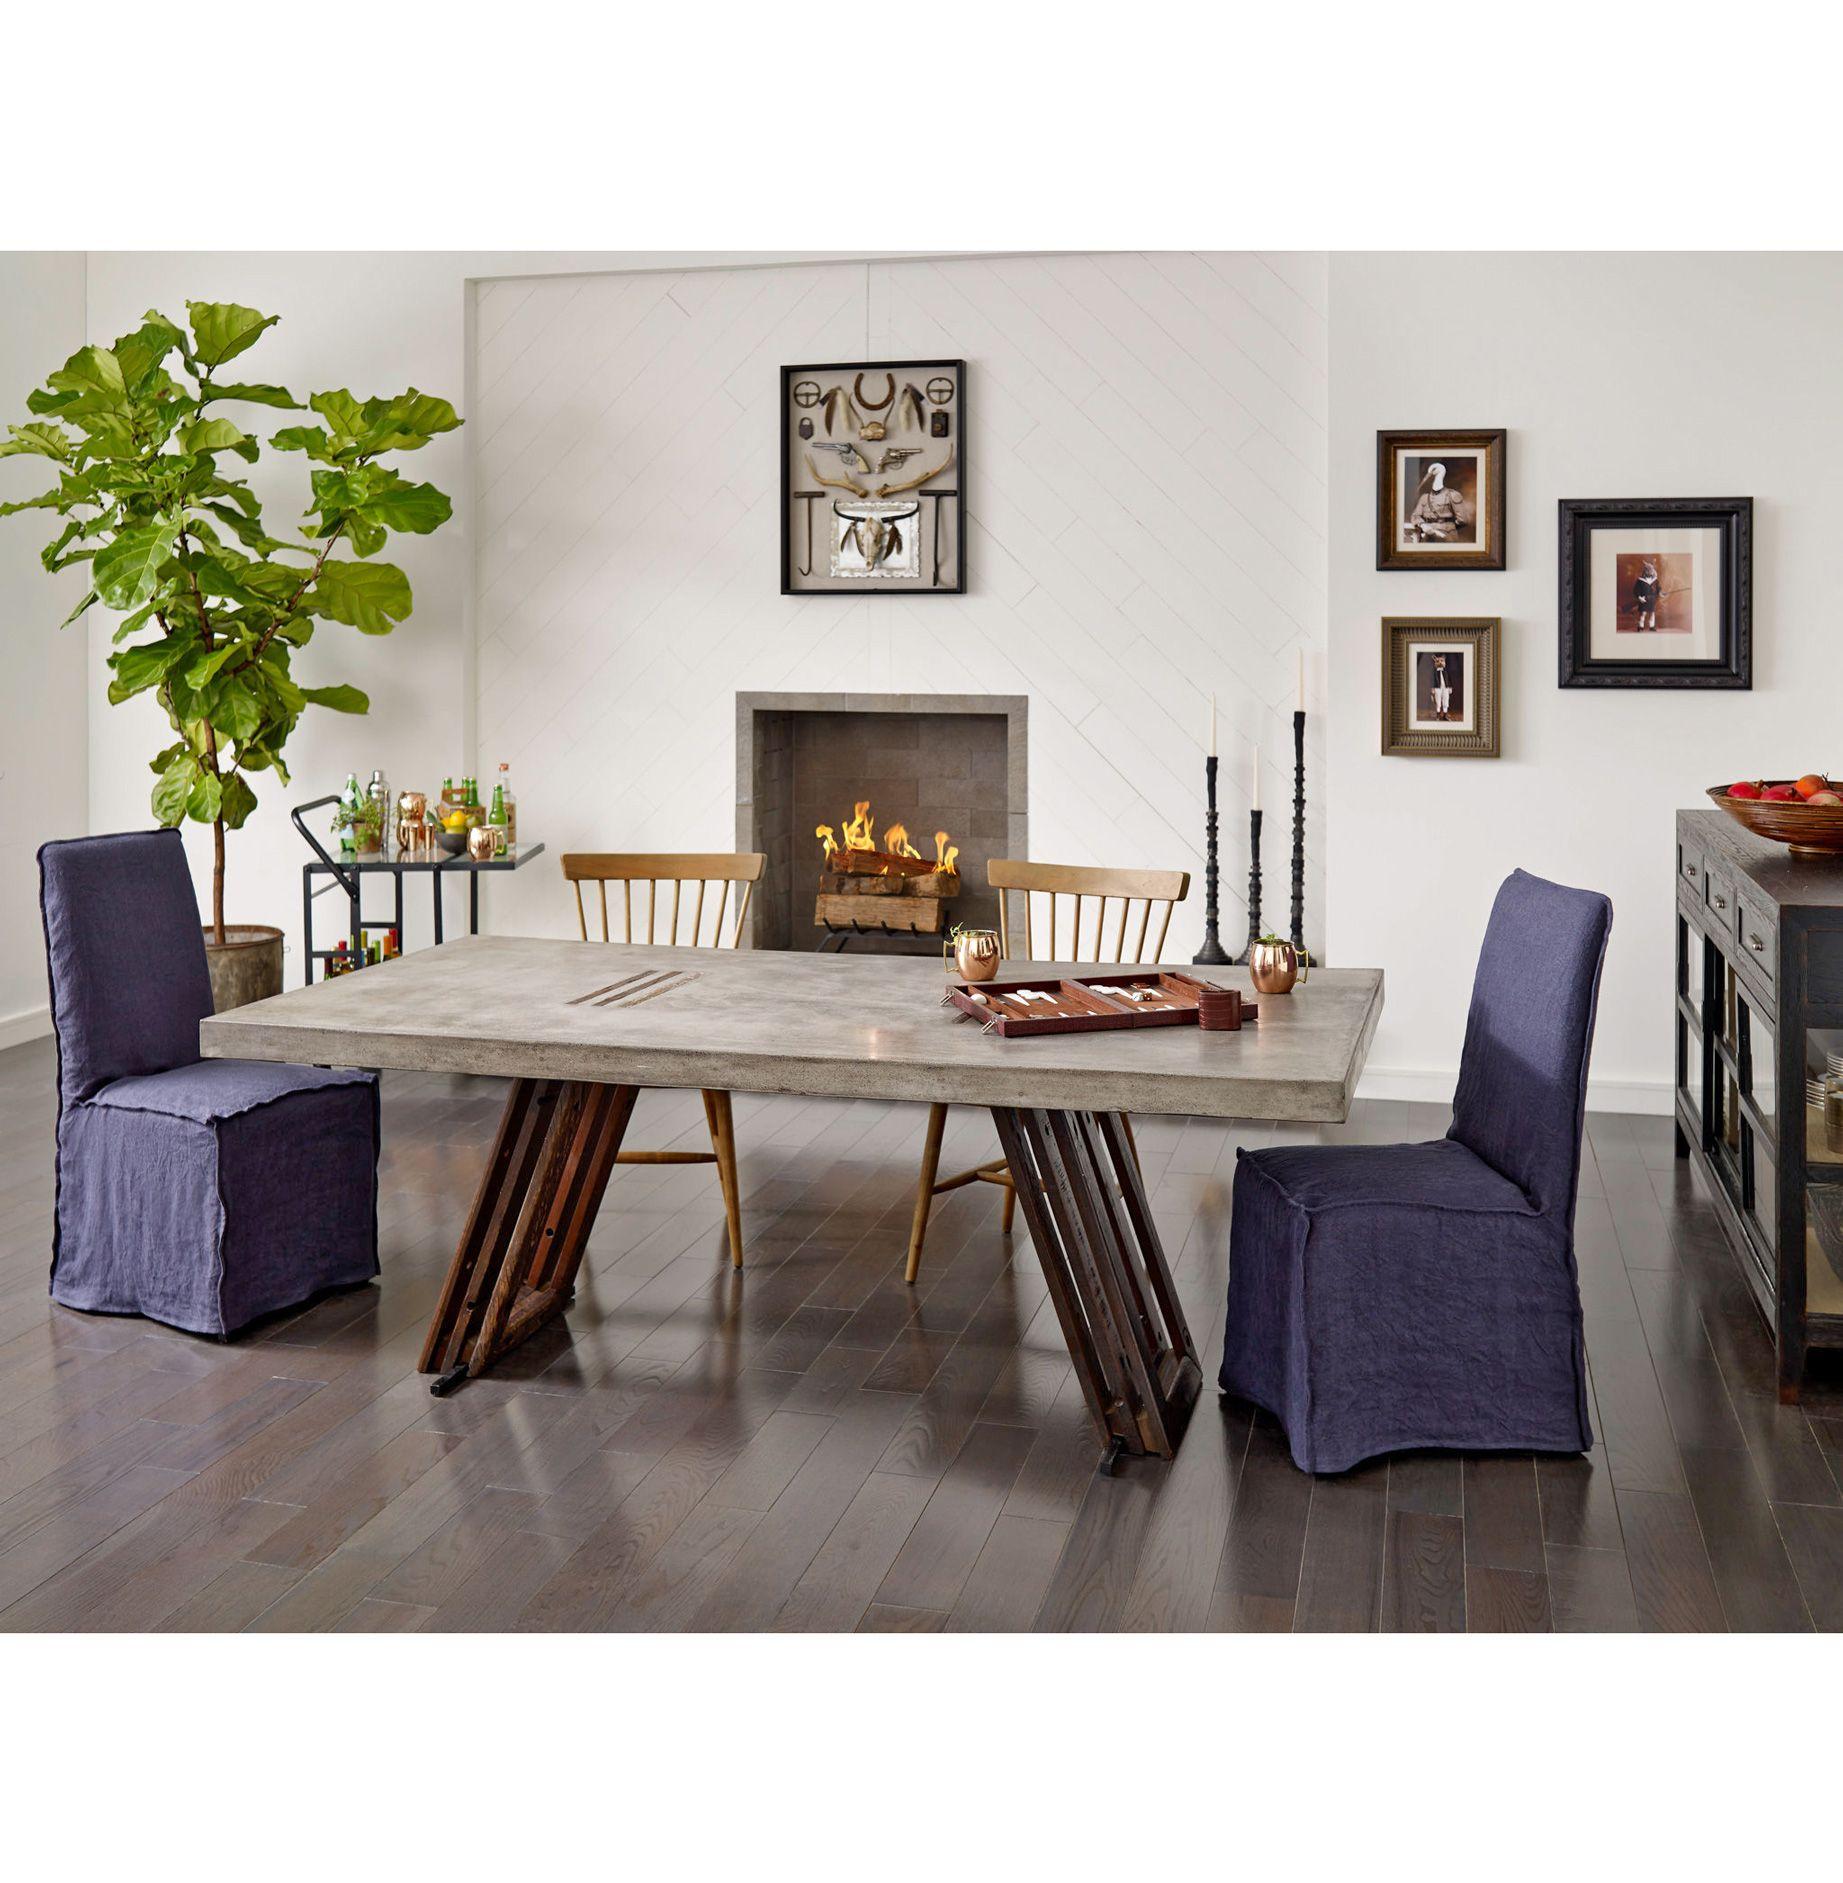 Lena Modern Classic Navy Blue Wrinkle Linen Slipcover Dining Chair - PAIR Side